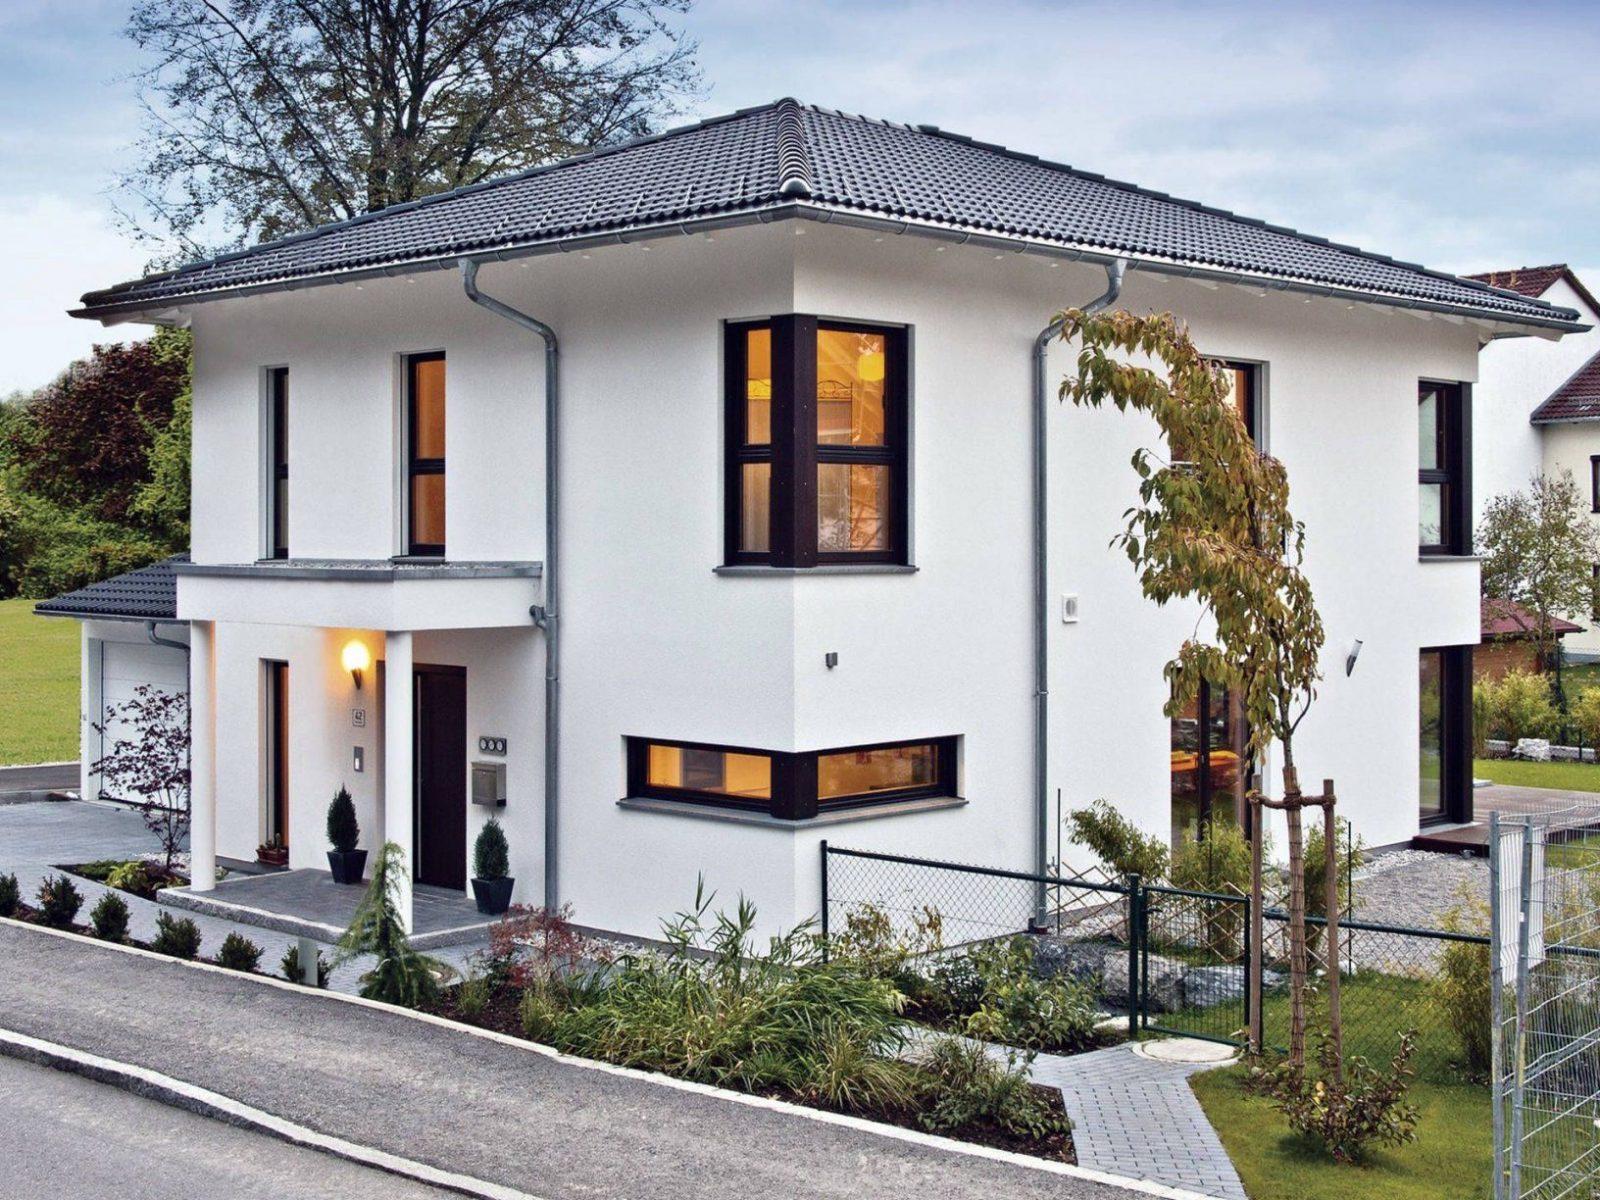 Haus Citylife 200 • Stadtvilla Von Weberhaus • Elegantes Stadthaus von Weber Haus City Life Bild